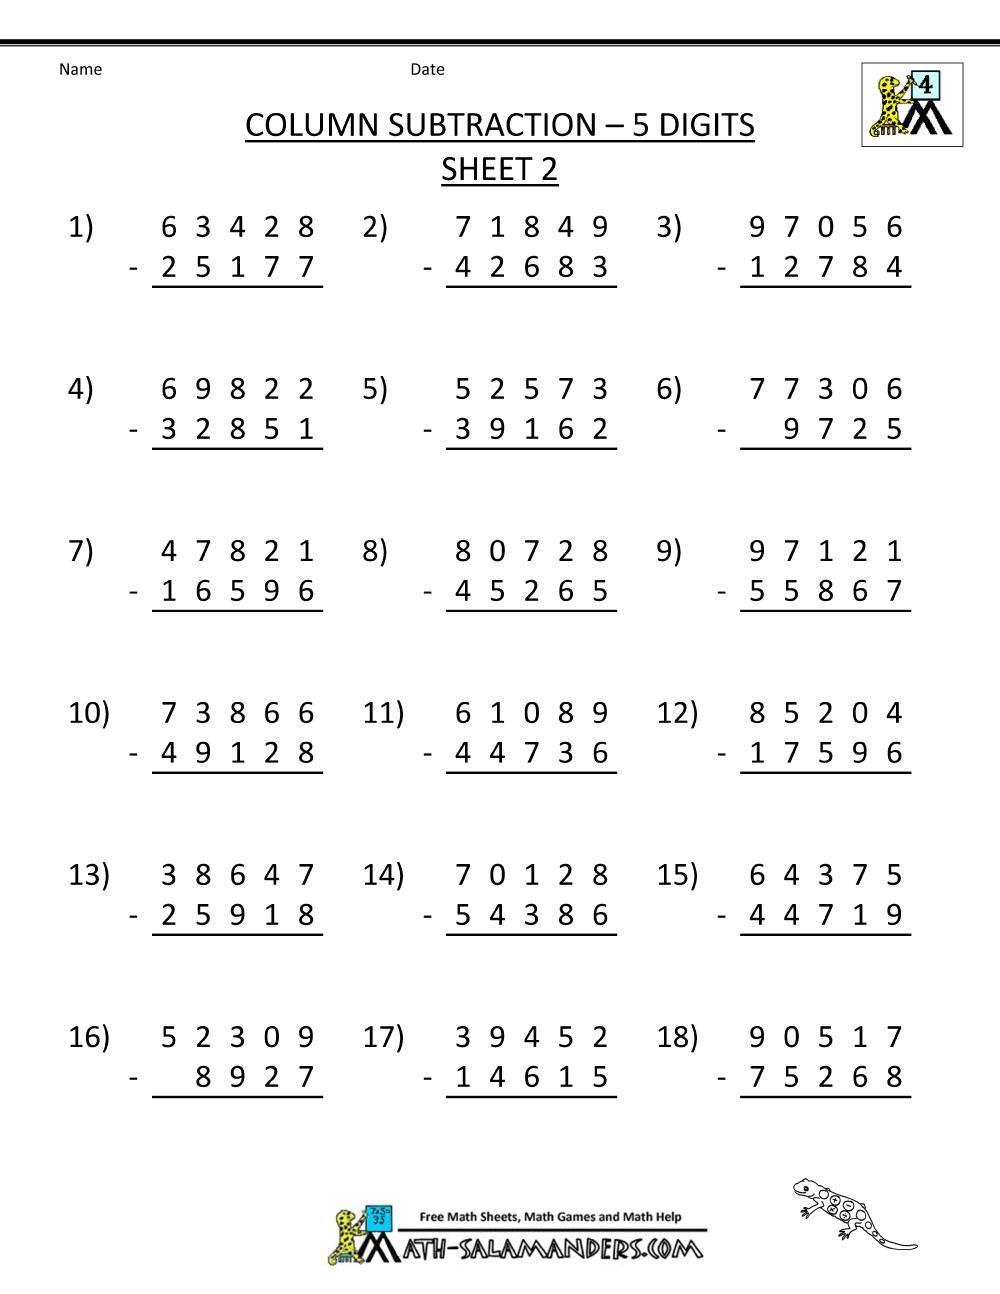 medium resolution of 16 Printable Math Worksheets For 4th Graders   4th grade math worksheets